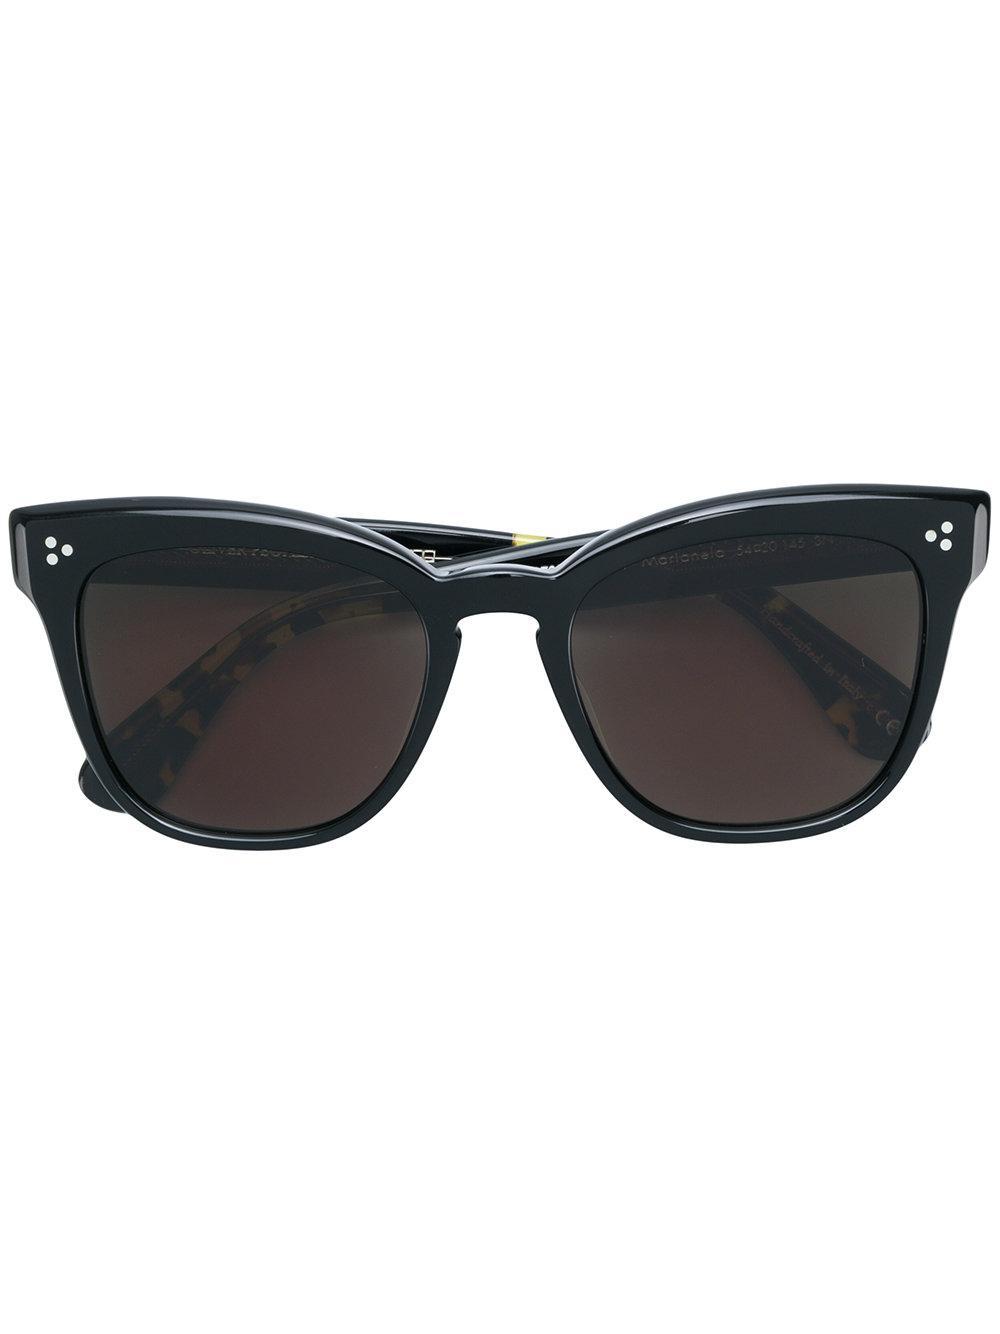 Oliver Peoples Cat Eye Sunglasses - Black